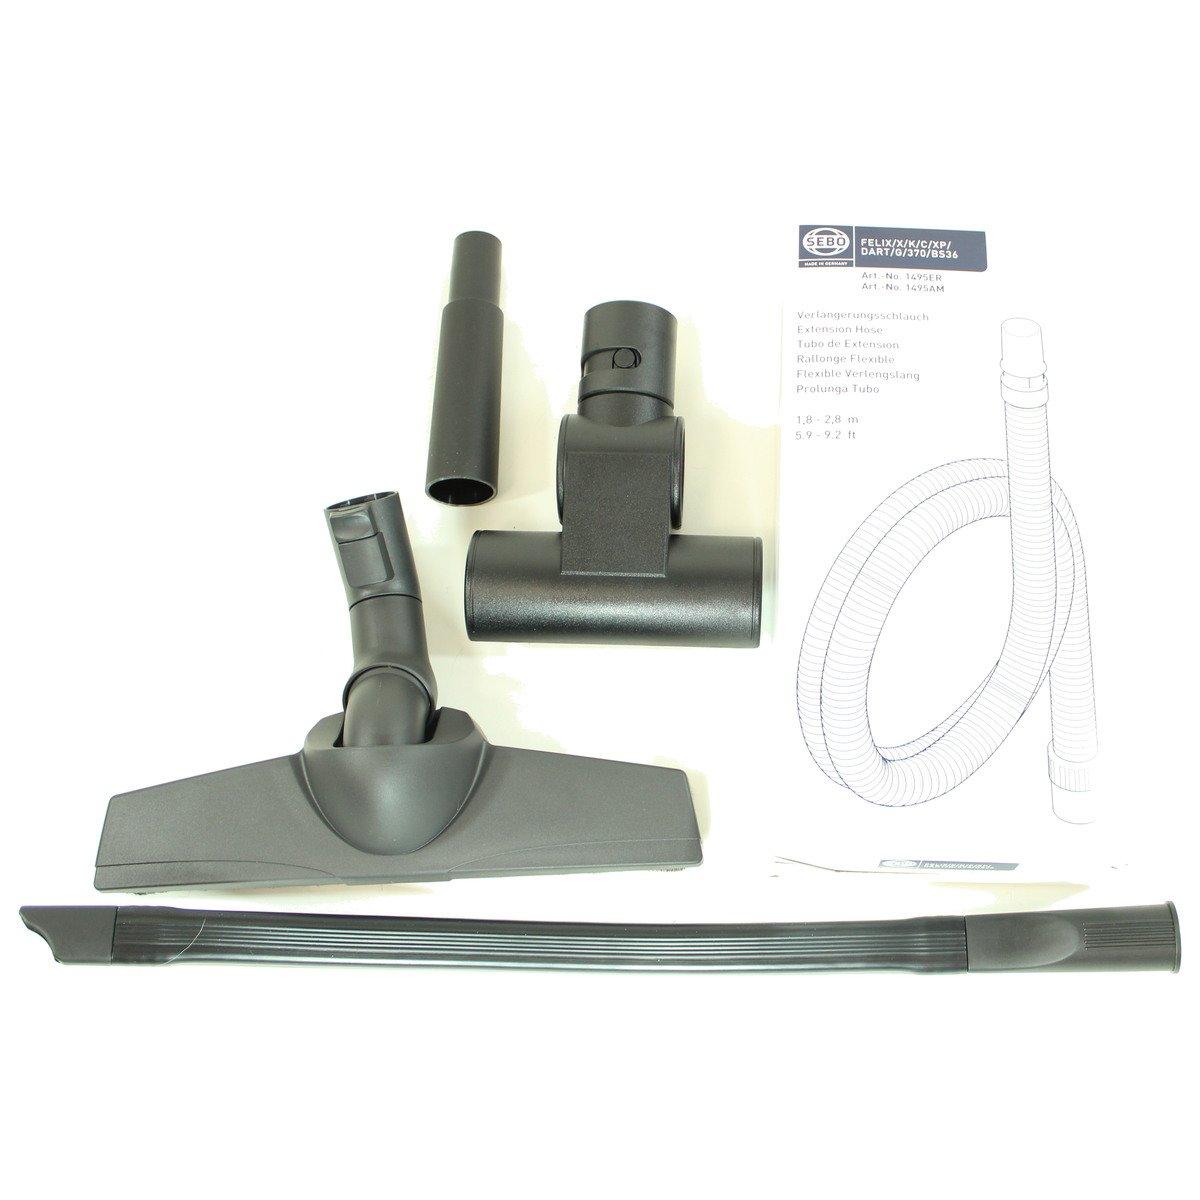 Sebo 5pc Canister Value Tool Pack 1996PK